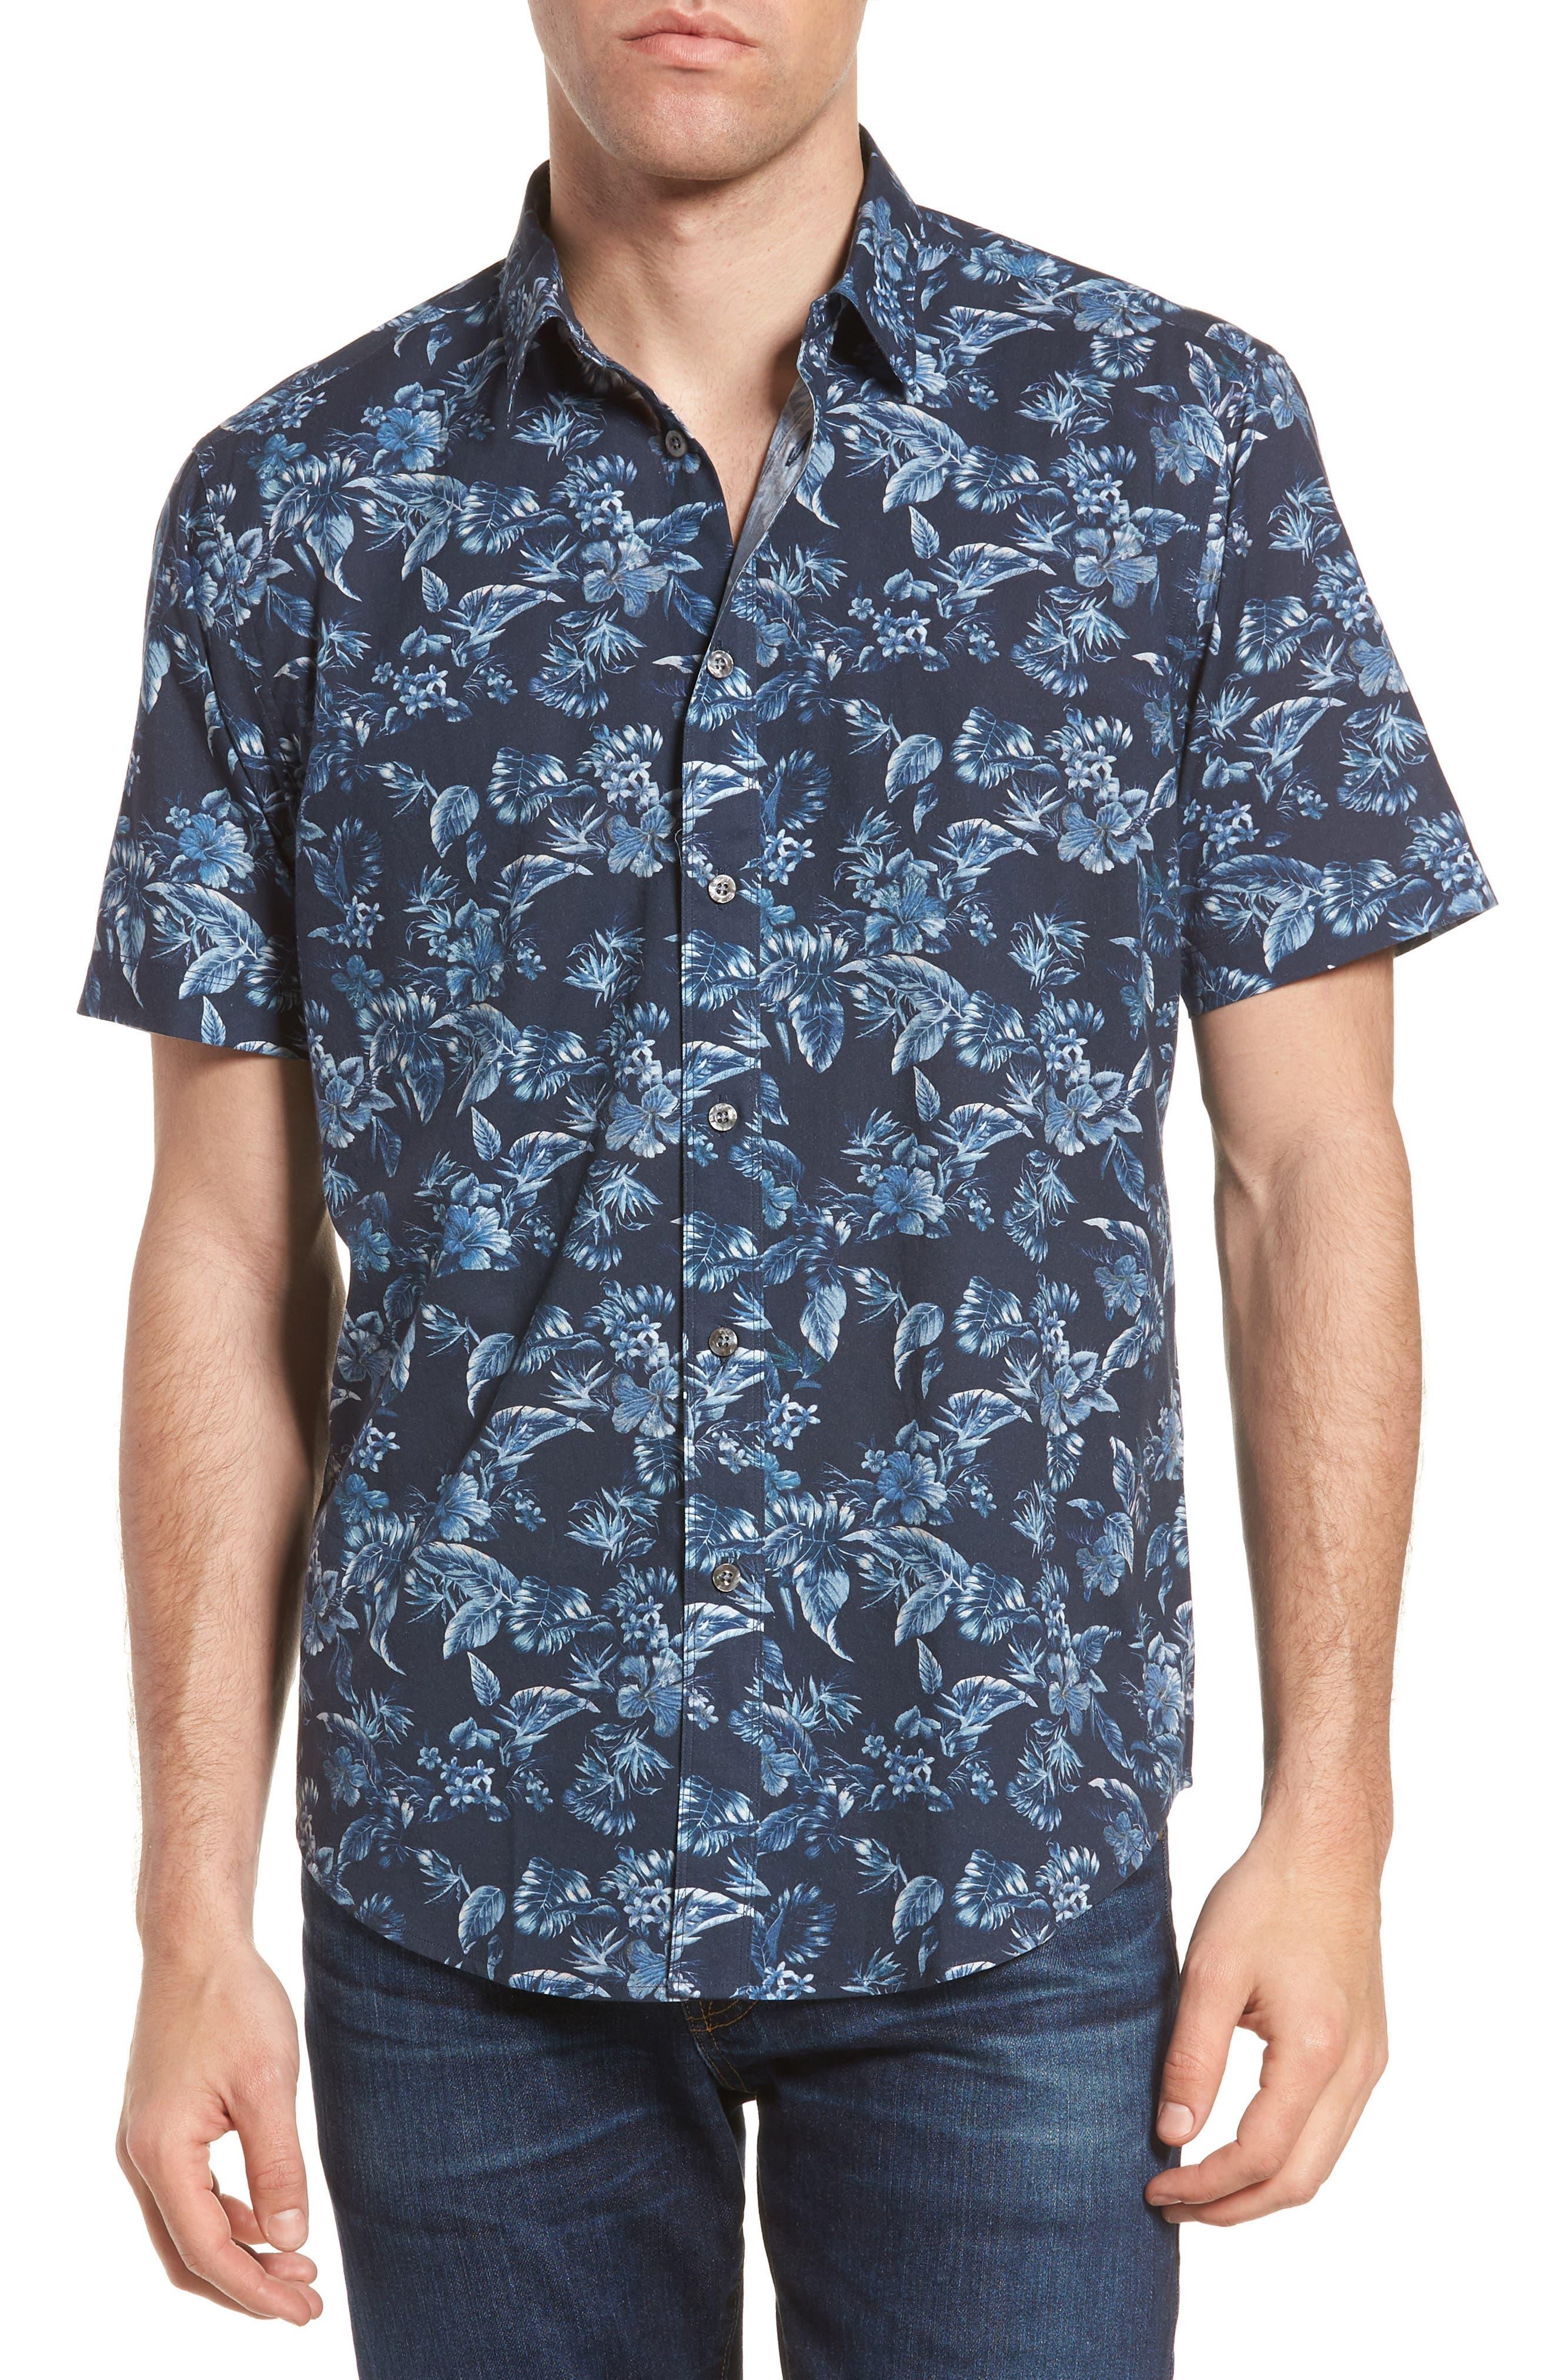 Coastaoro Califoras Regular Fit Print Sport Shirt